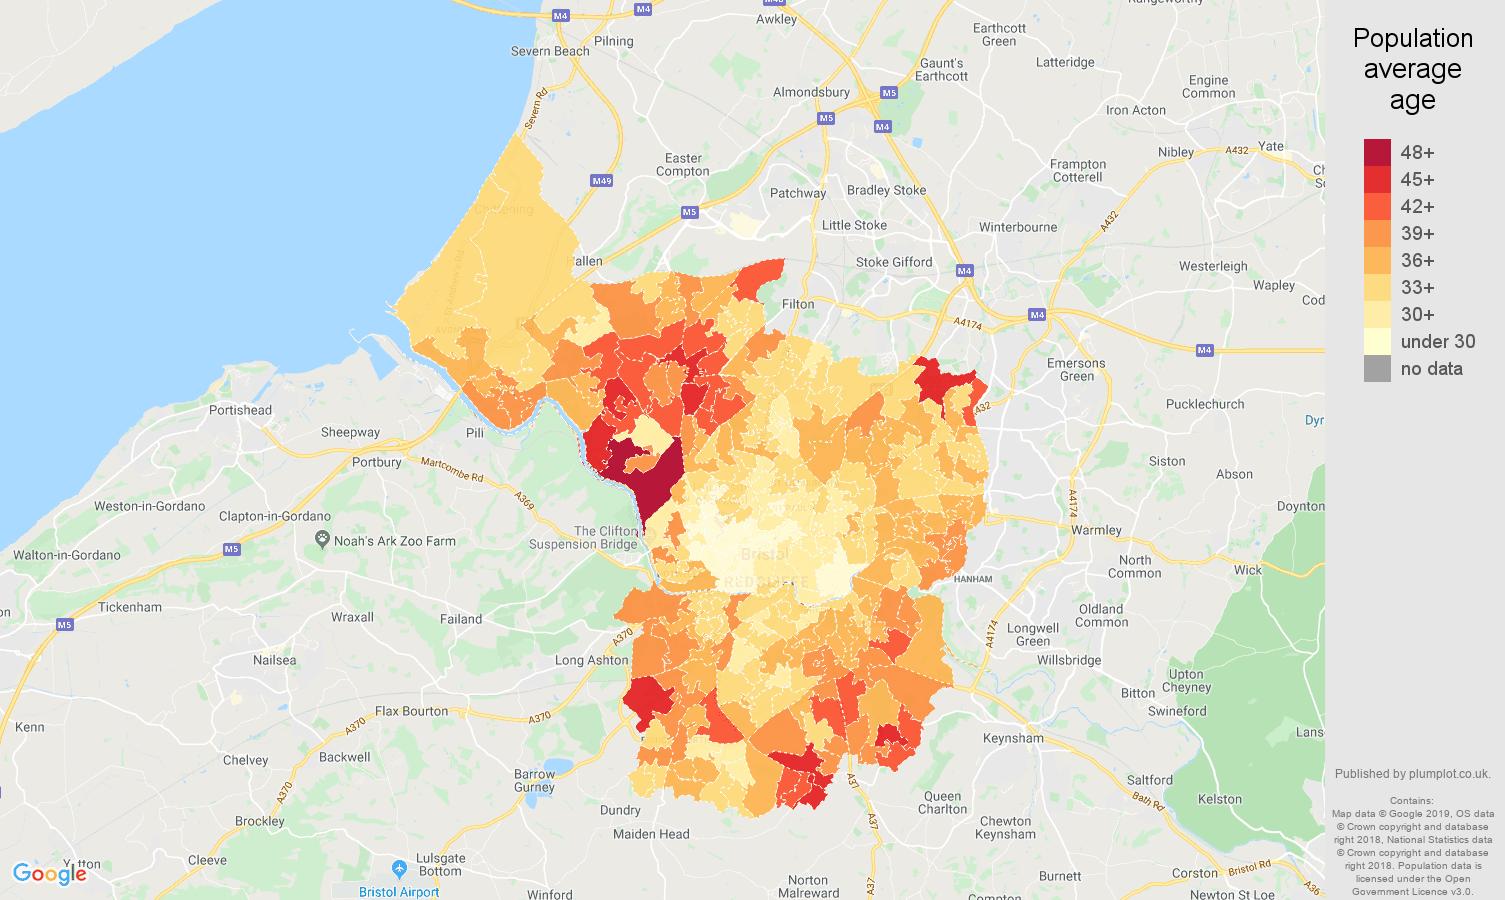 Bristol county population average age map